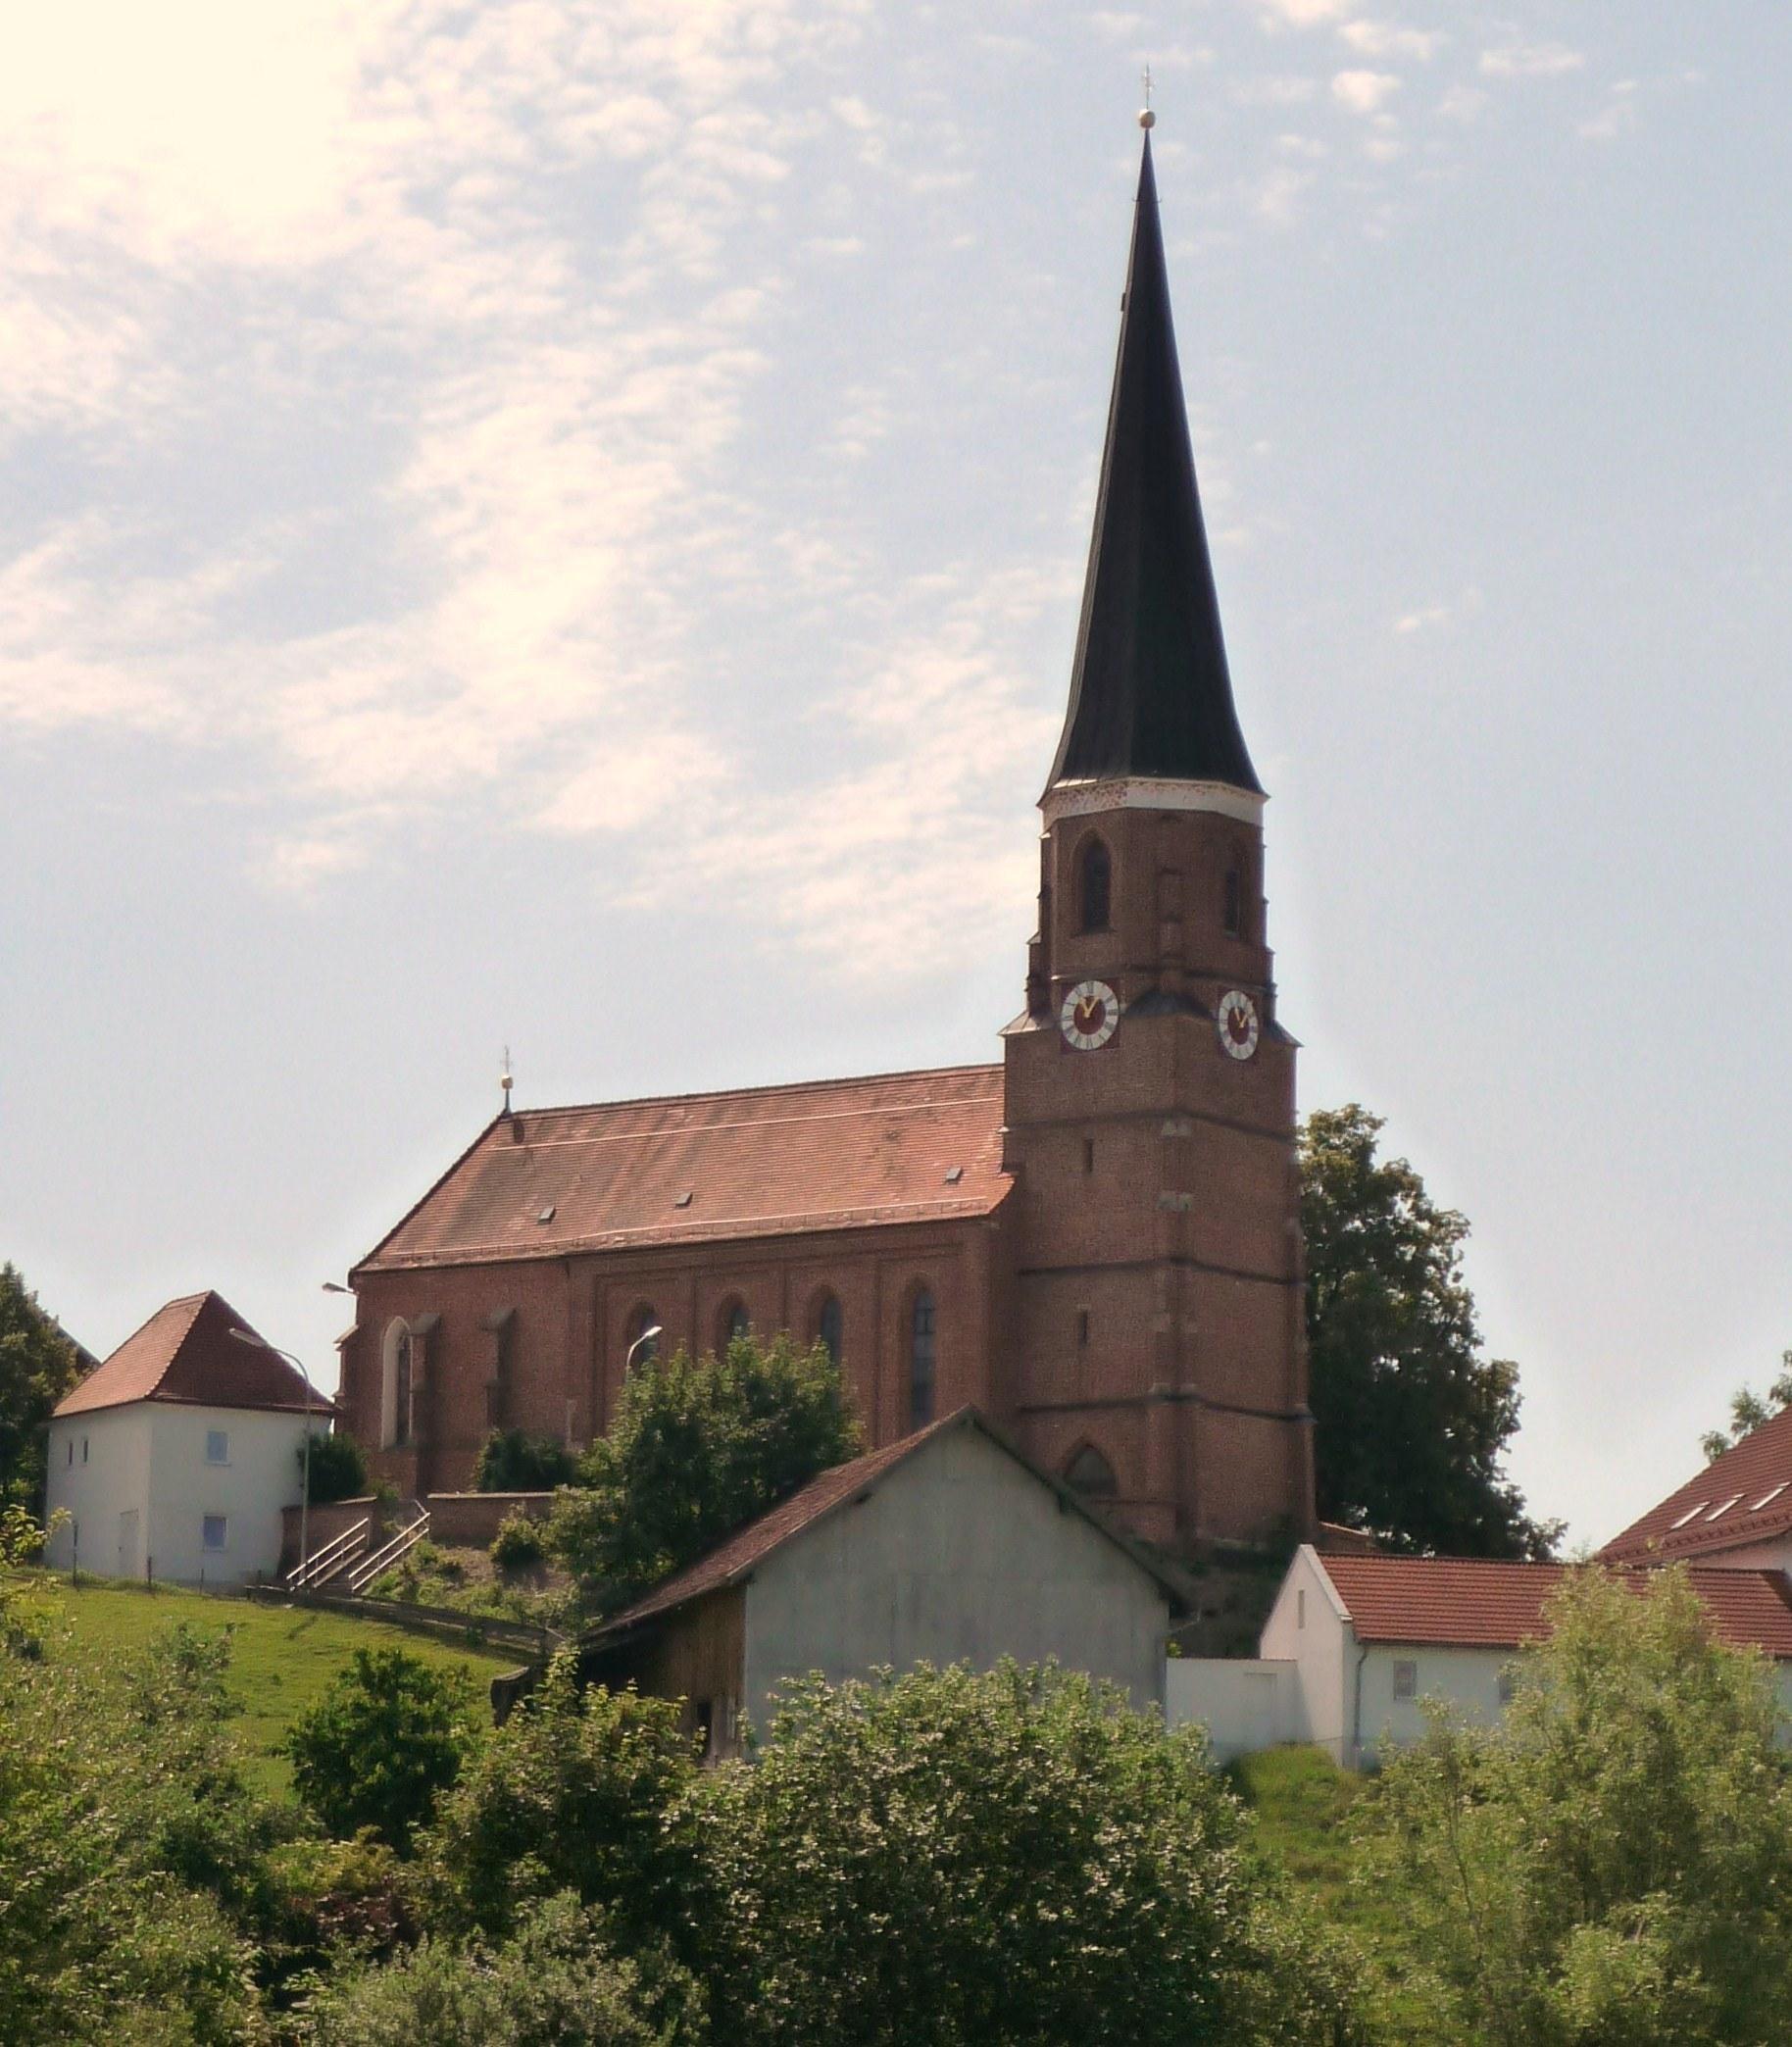 Pfarrkirche Hirschhorn